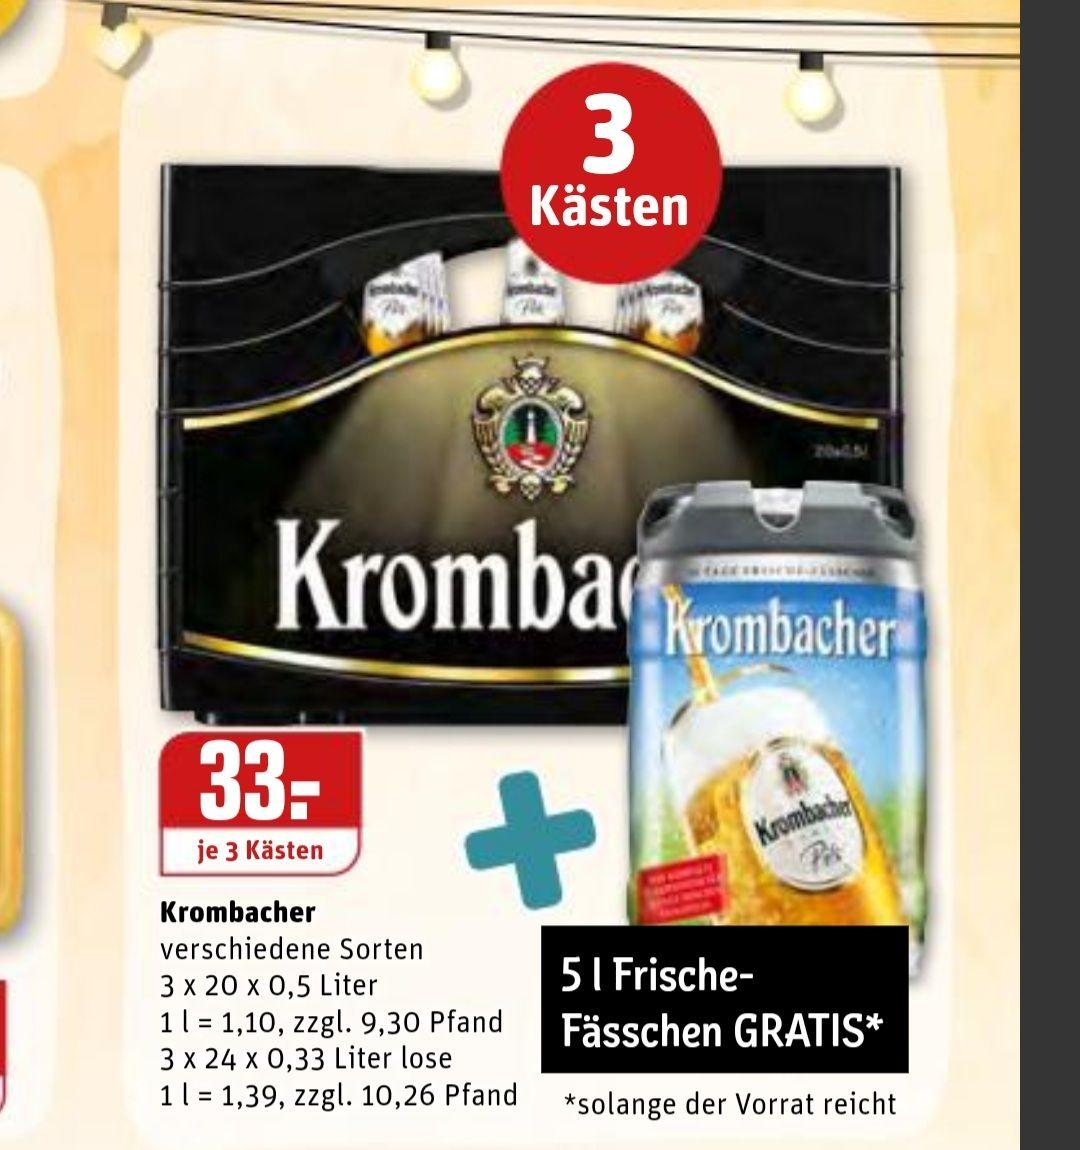 3 Kästen Krombacher + 5l Frische Fässchen